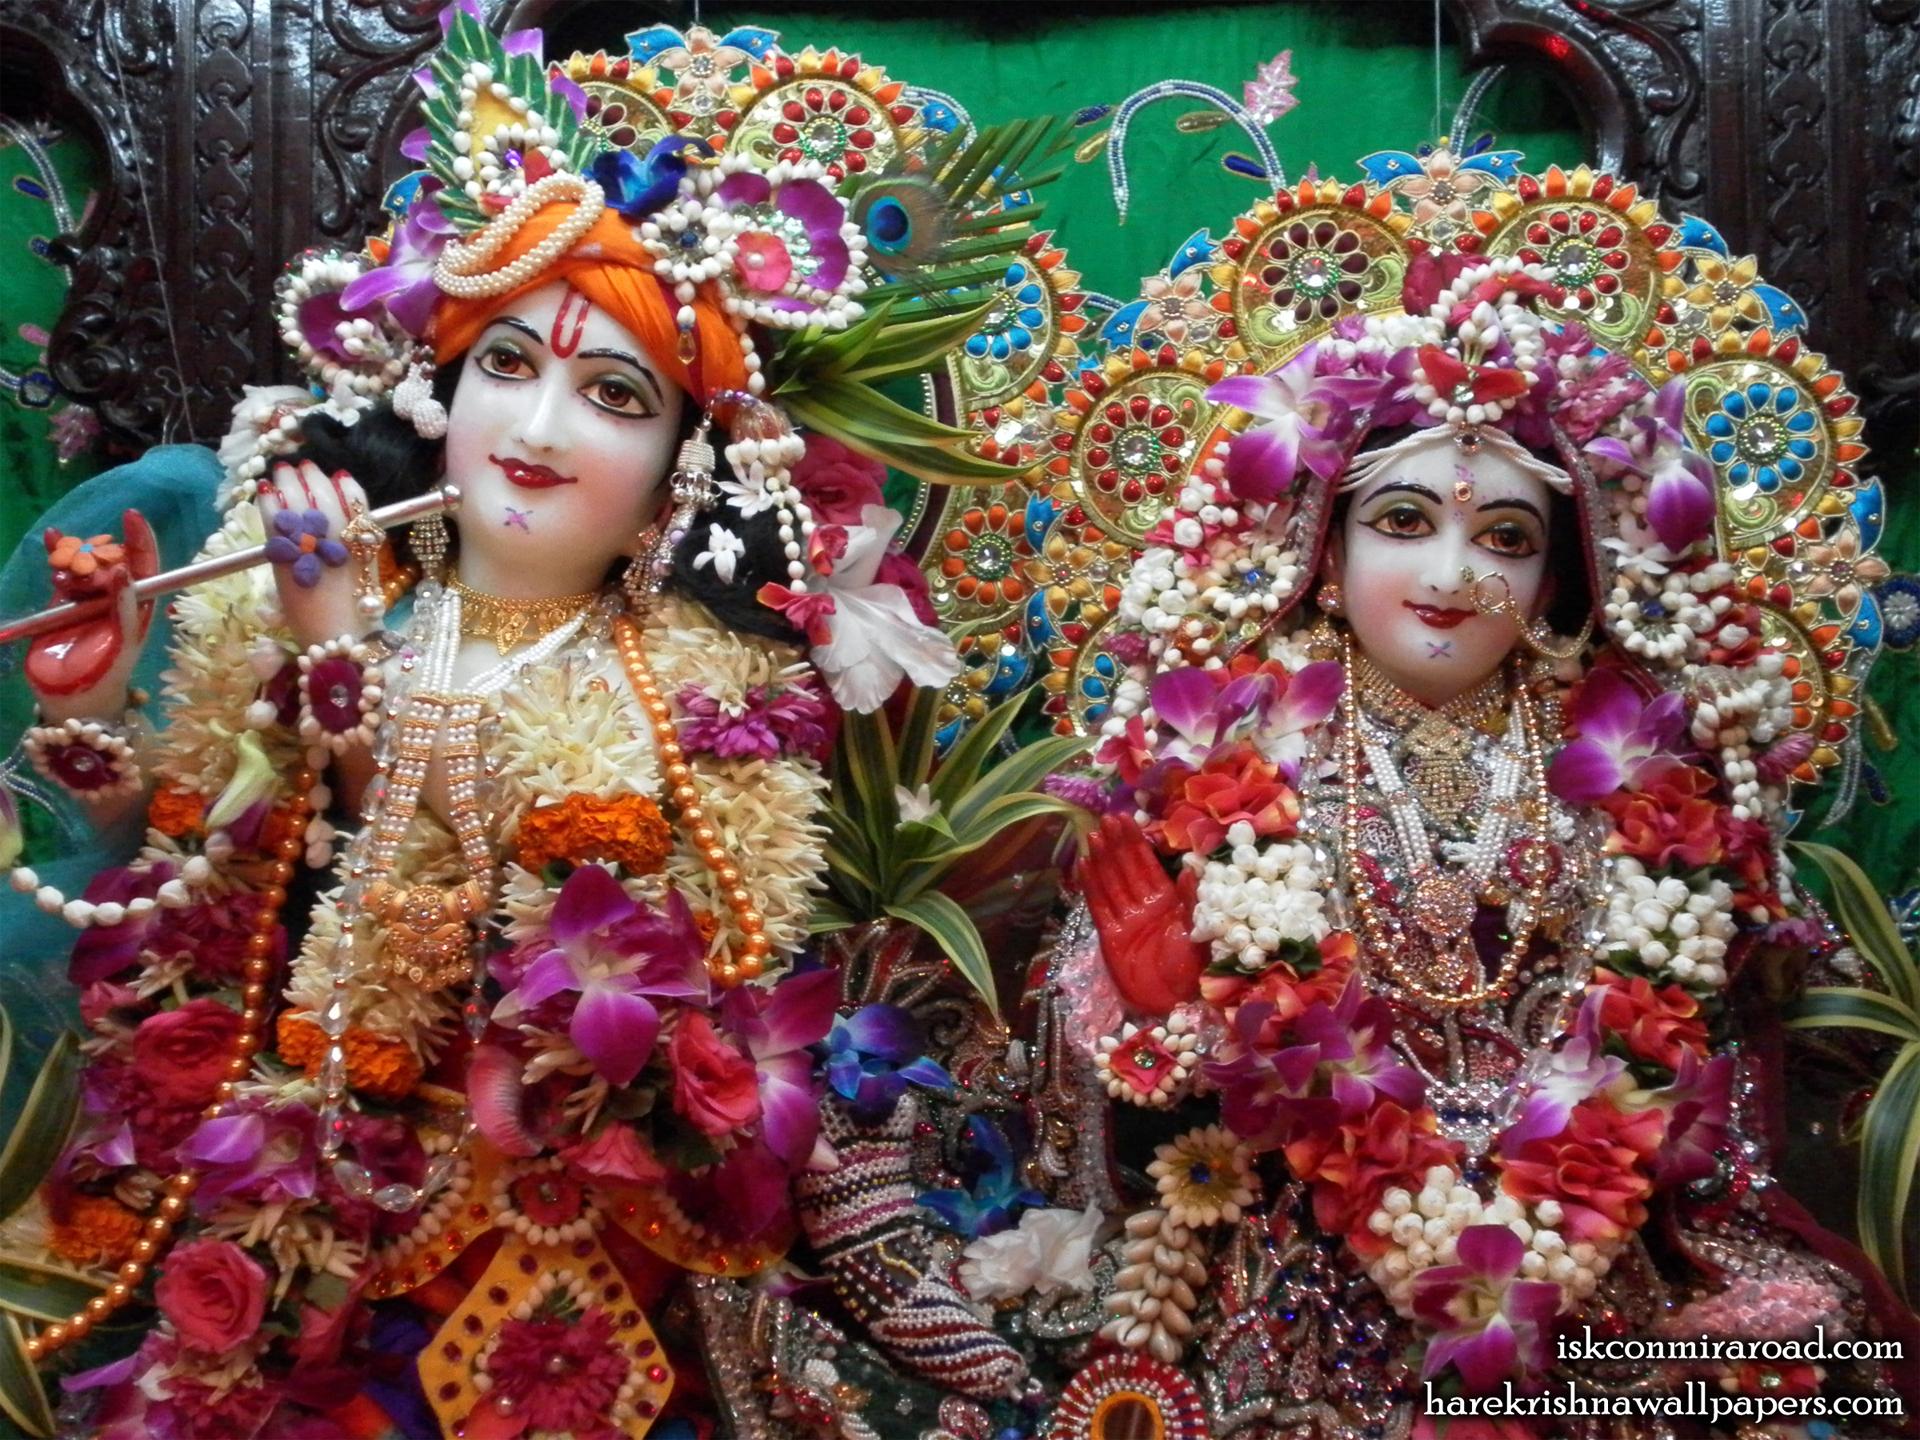 Sri Sri Radha Giridhari Close up Wallpaper (004) Size 1920x1440 Download